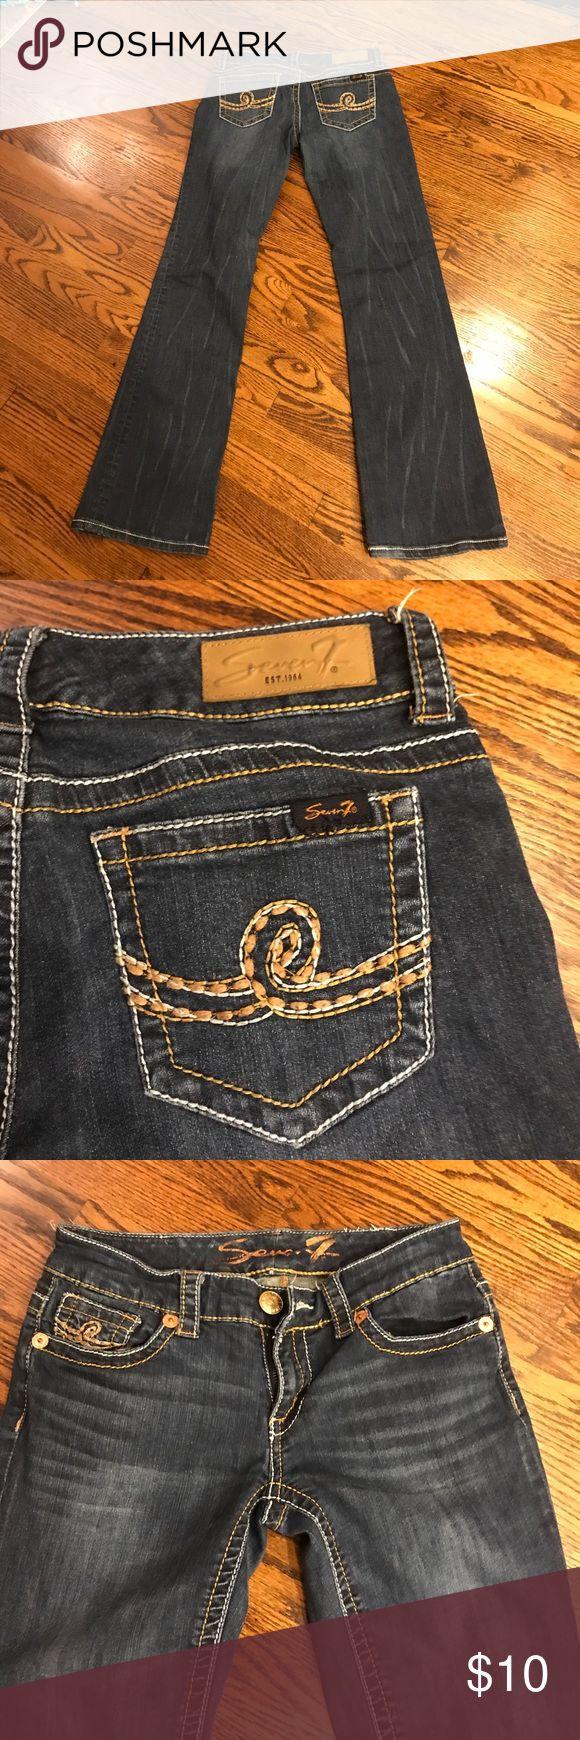 7 Seven jeans Seven jeans 29 inch inseam Seven7 Jeans Boot Cut